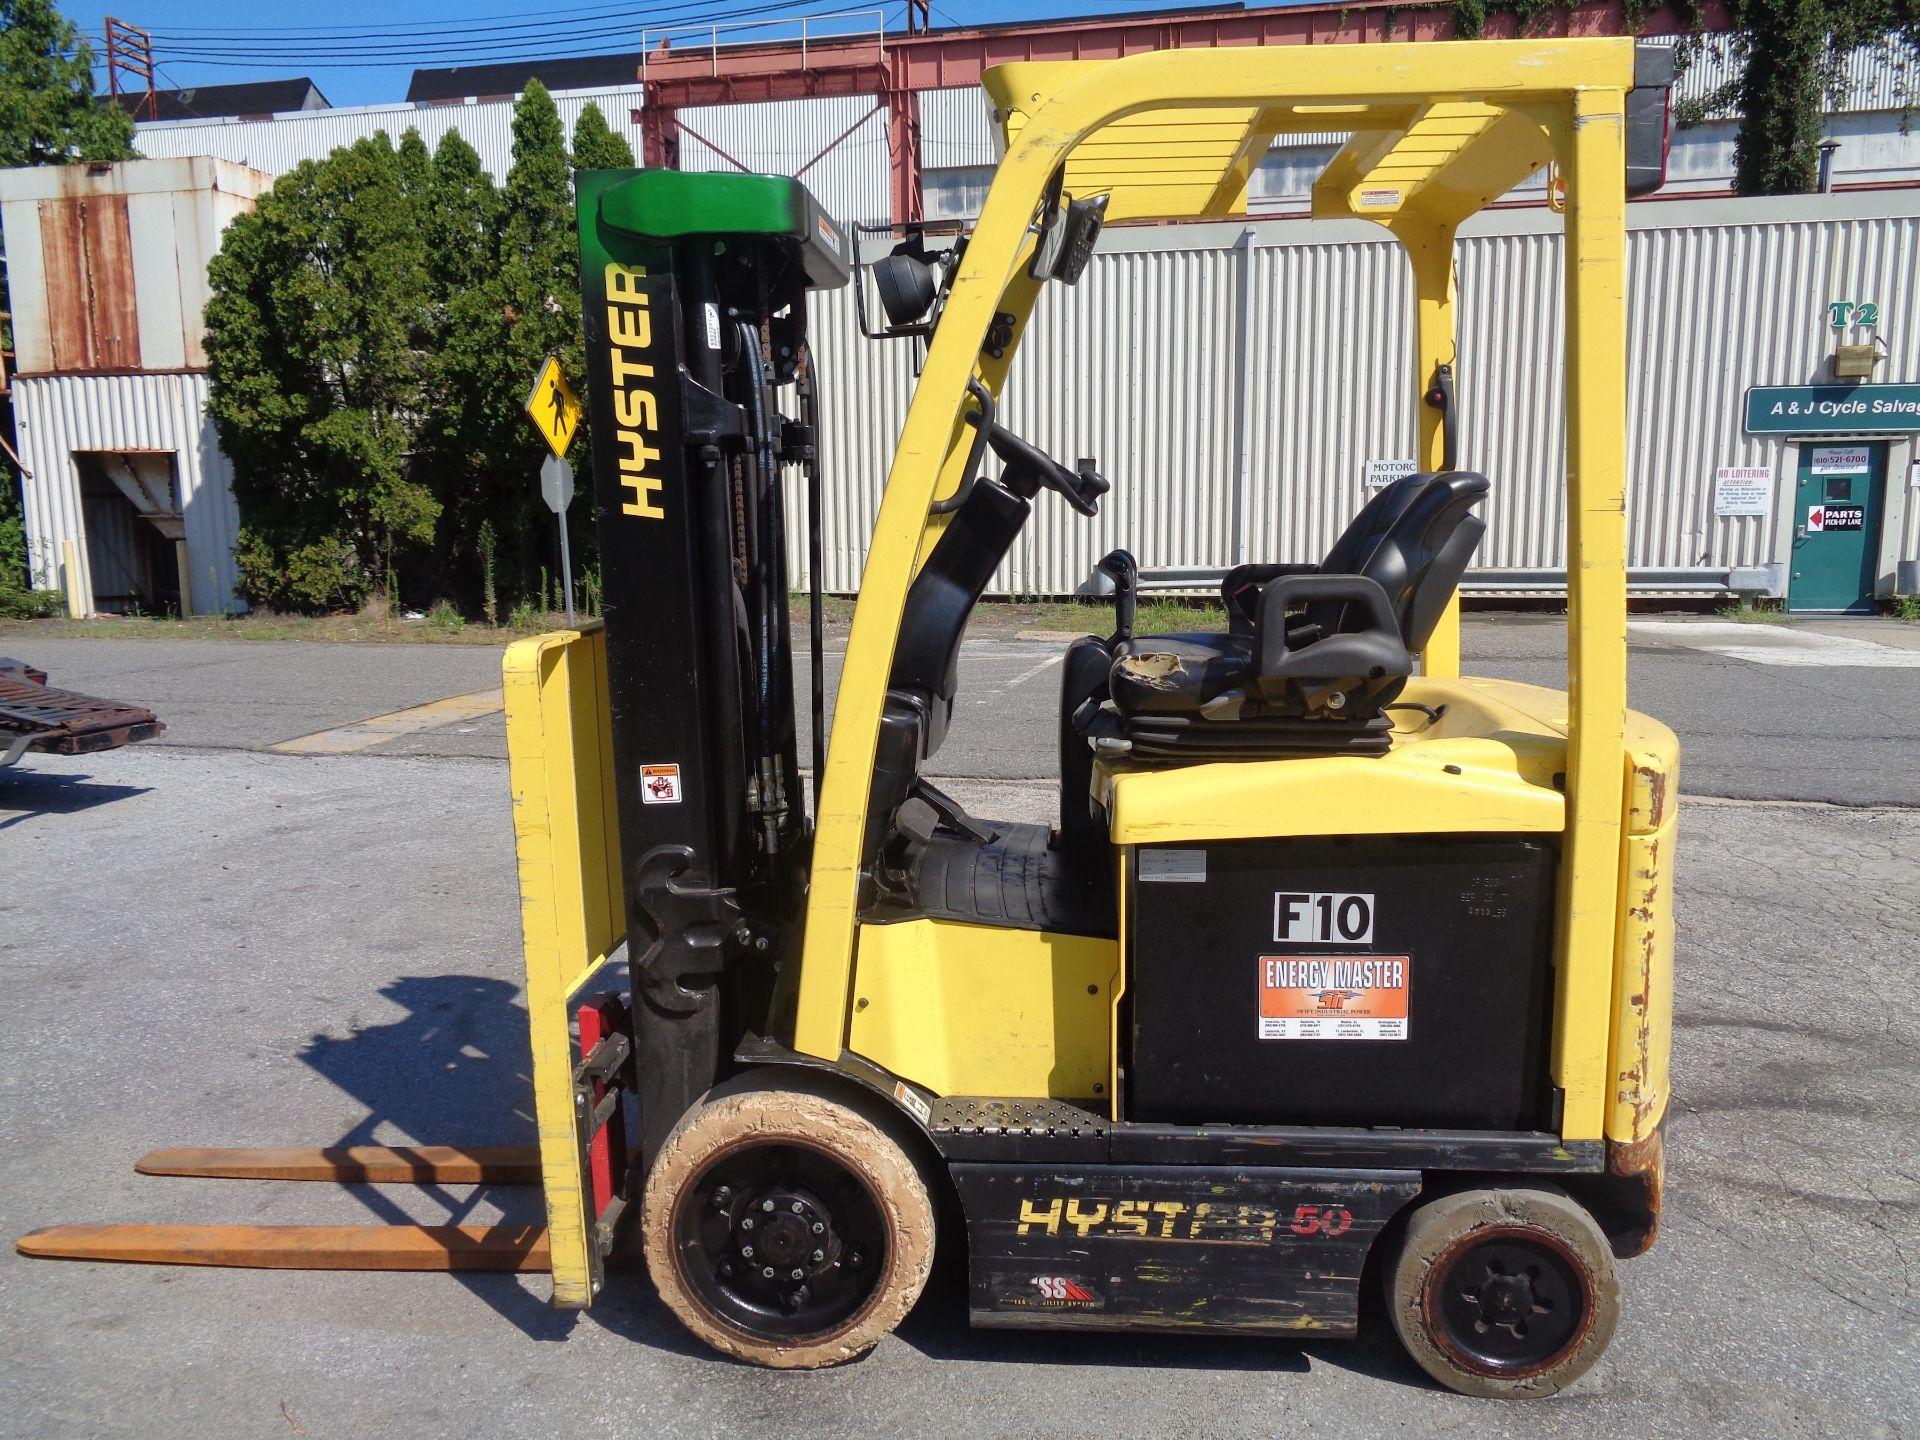 Lot 51 - 2016 Hyster E50XN-27 5,000lb Forklift